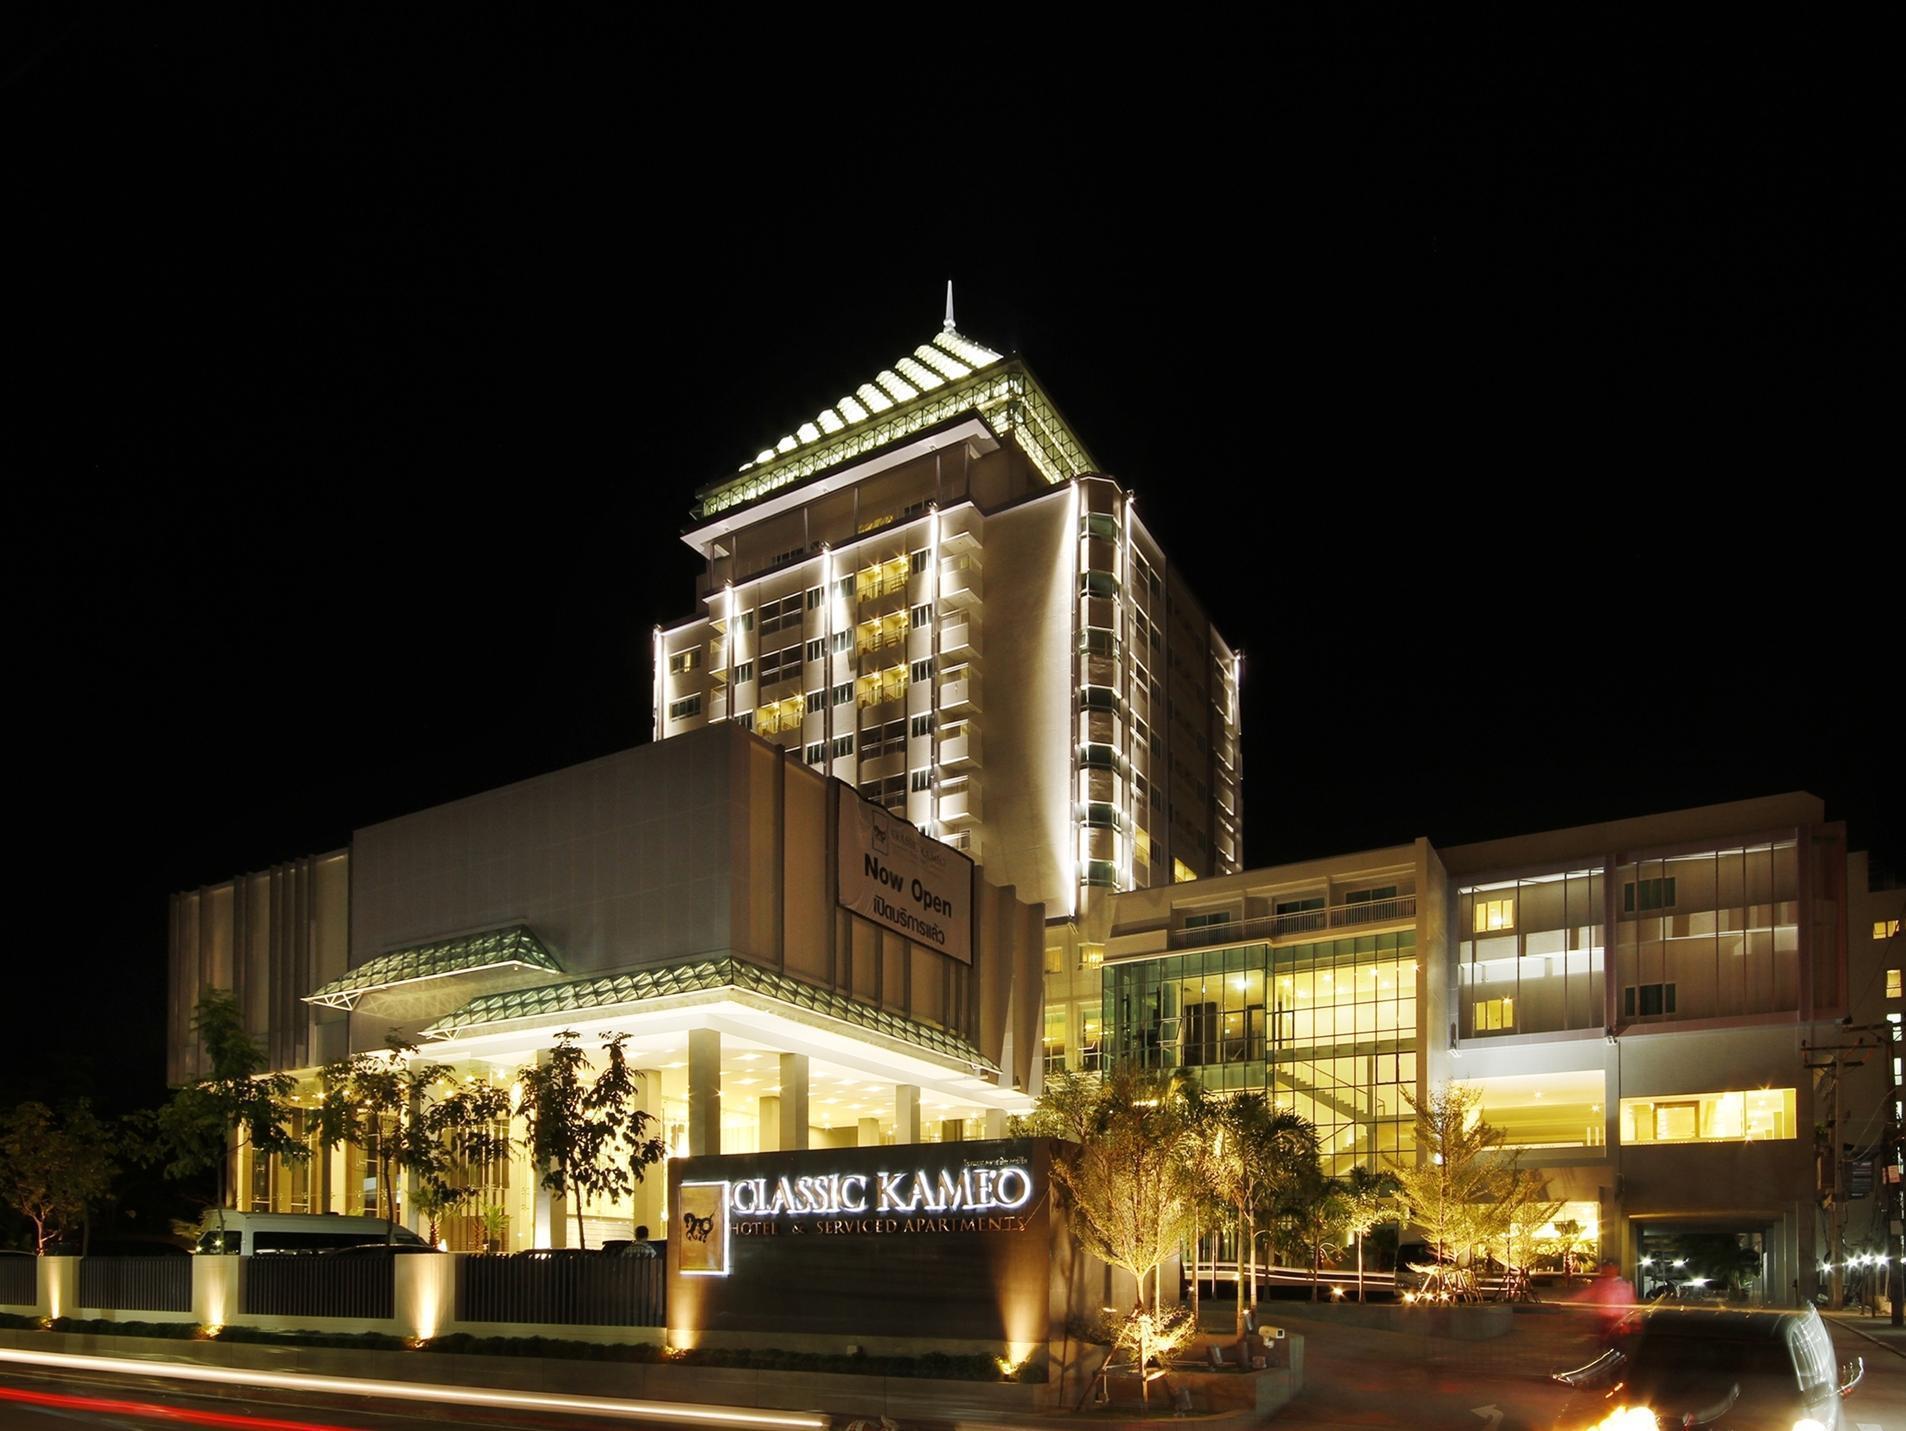 Classic Kameo Hotel & Serviced Apartments Rayong คลาสสิก คามิโอ โฮเต็ล แอนด์ เซอร์วิซ อพาร์ตเมนต์ ระยอง